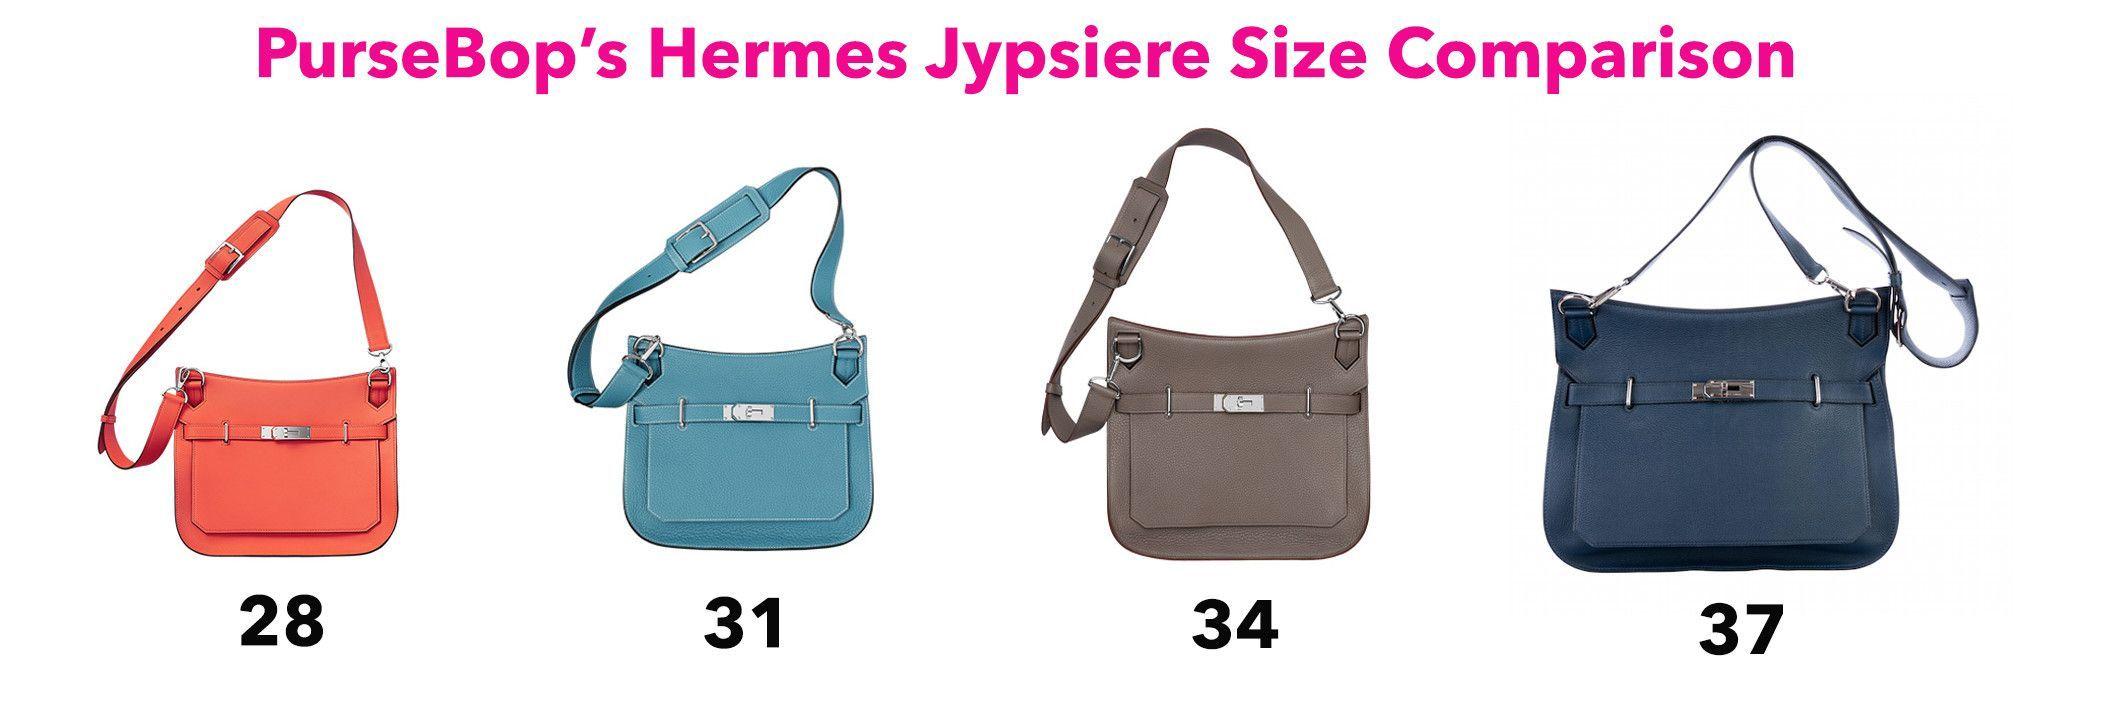 2c770753bd2ff Hermes Highlight: Hermes Jypsiere Reference Guide - PurseBop